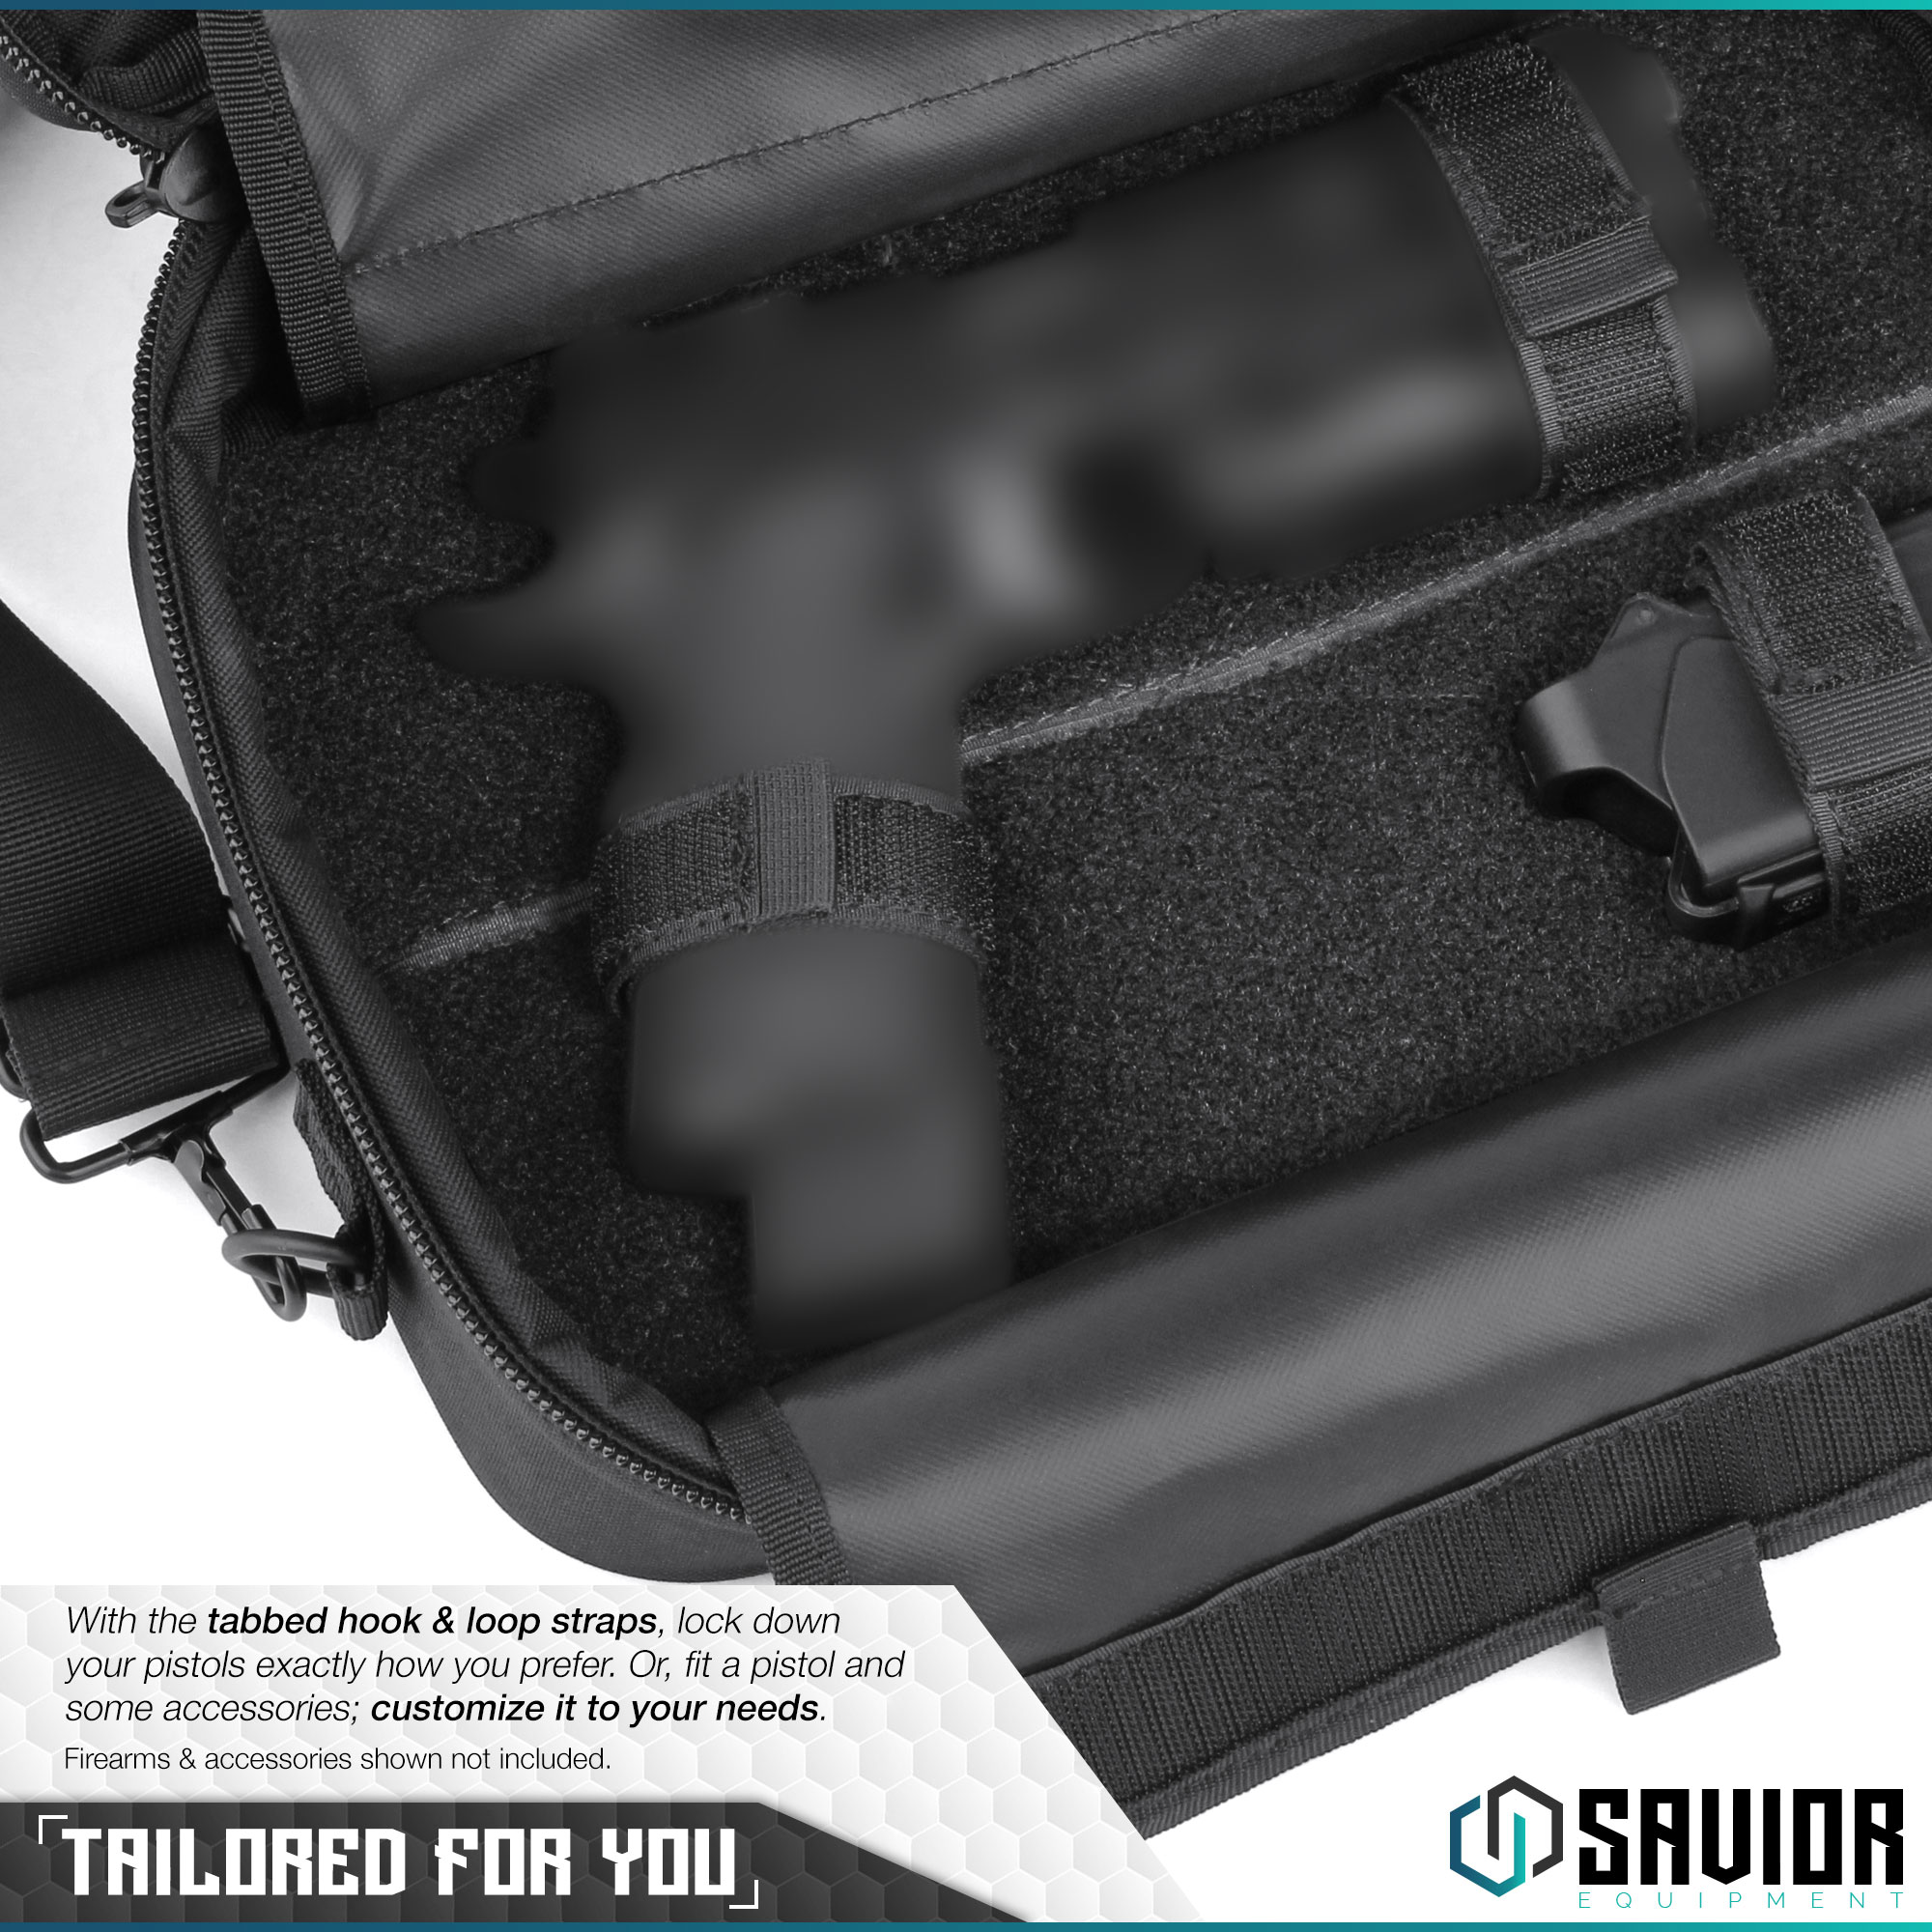 034-SAVIOR-034-Padded-Discreet-Double-Handgun-Bag-Pistol-Storage-Case-w-Mag-Pouch-Slot thumbnail 16